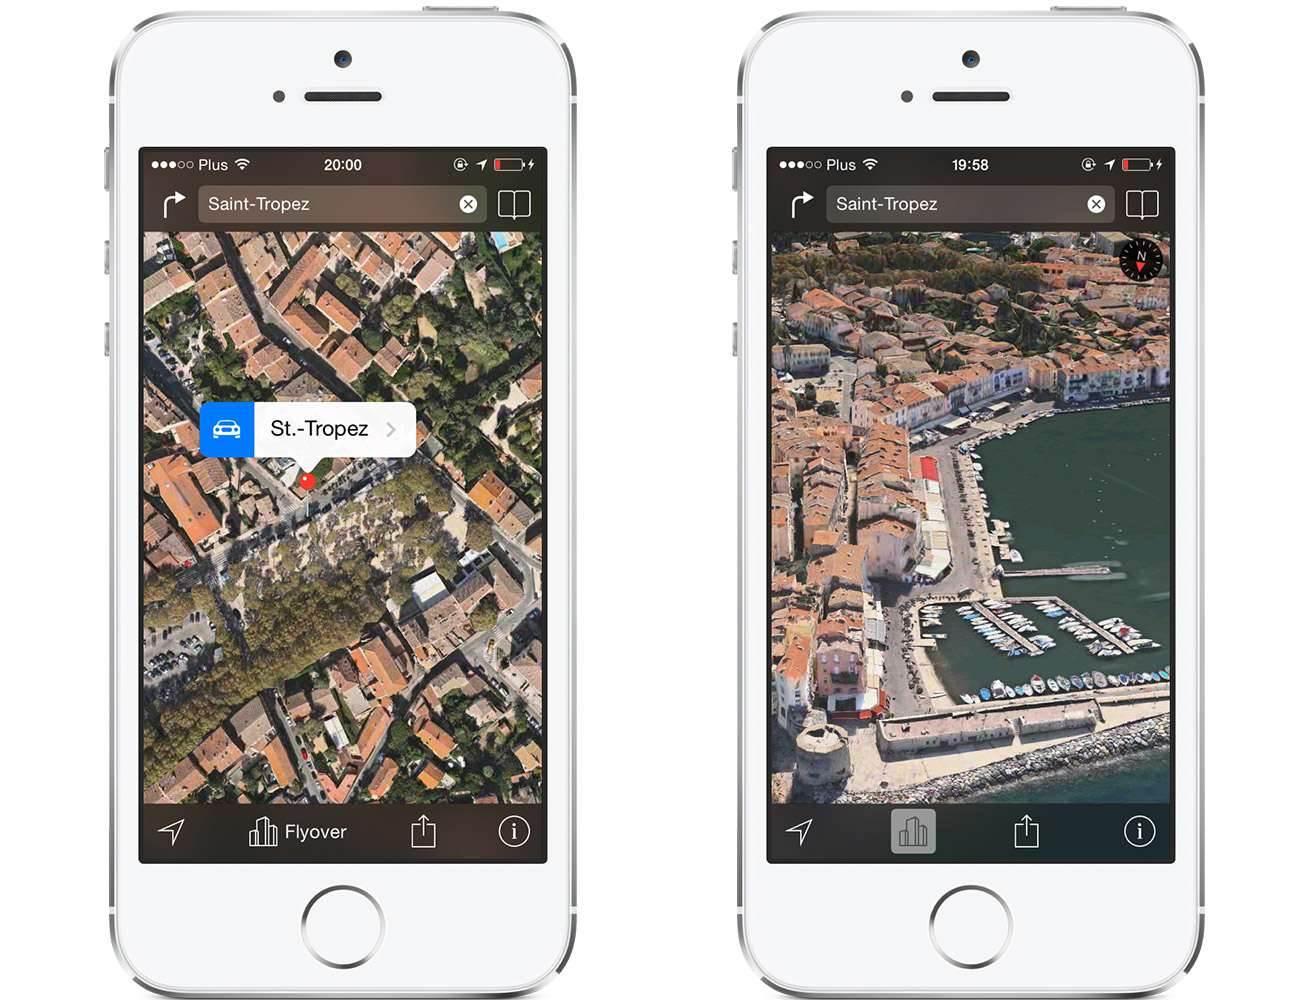 Mapy3D.onetech.pl